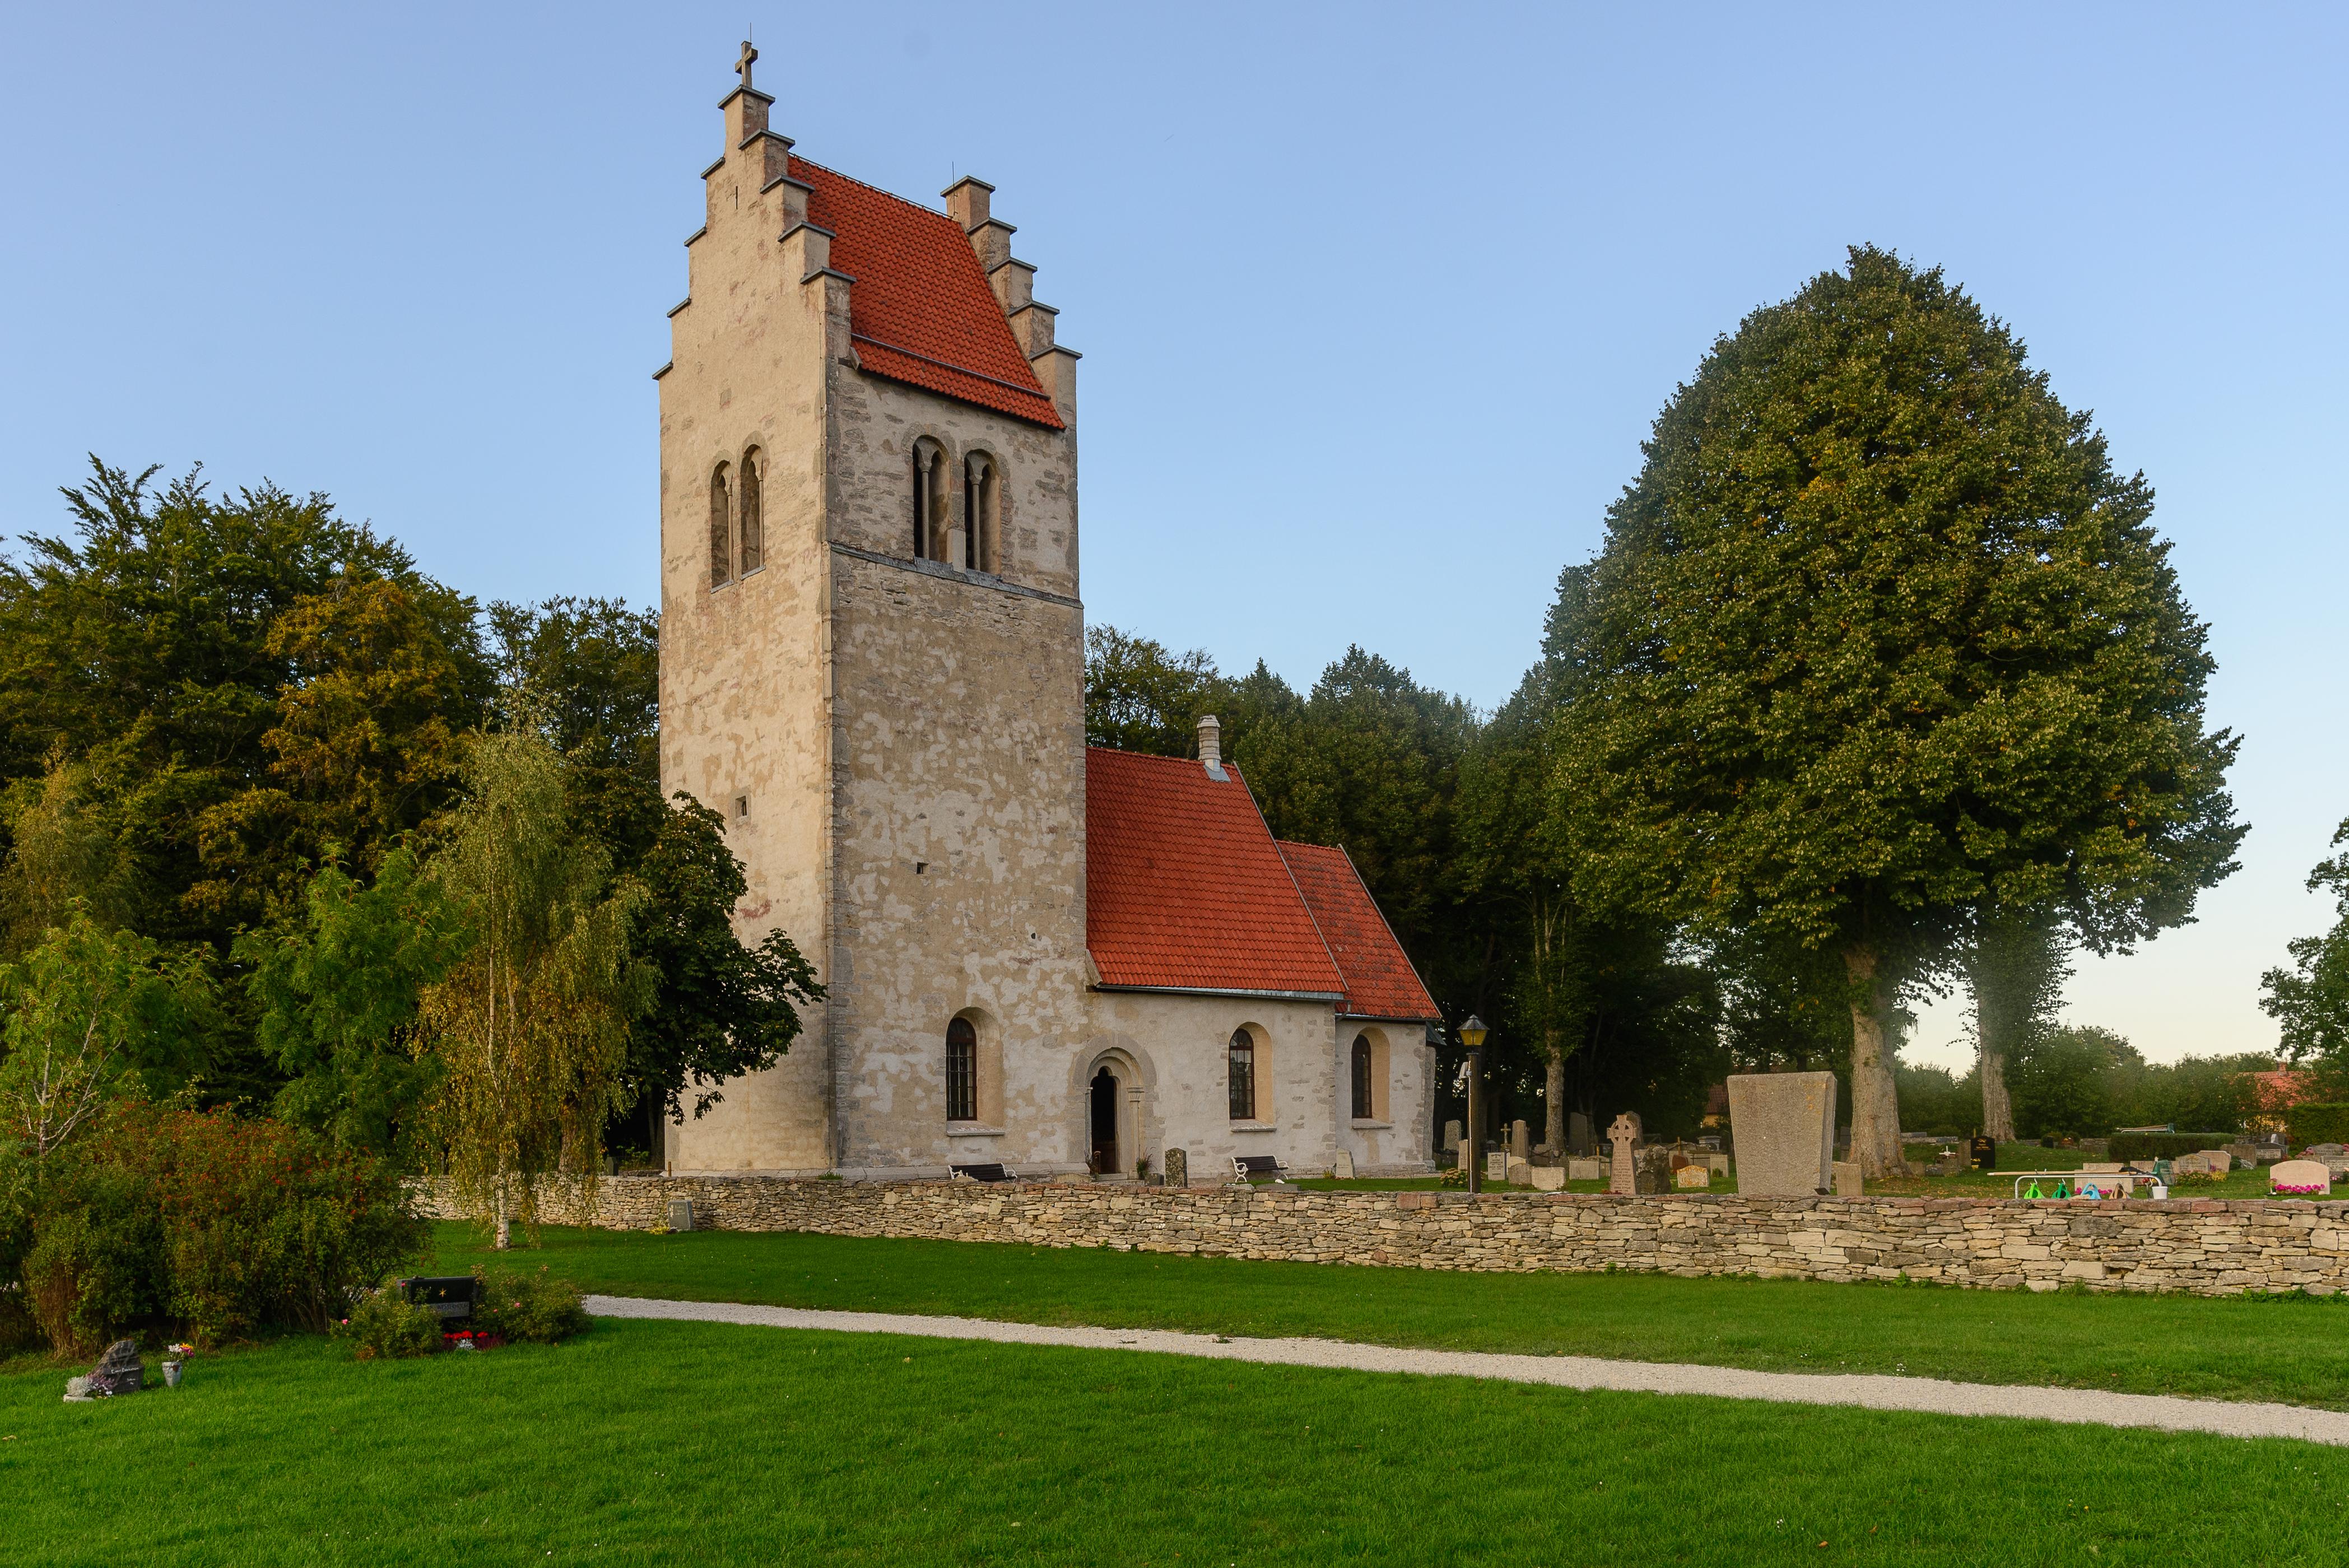 Västerhejde Church - Wikipedia